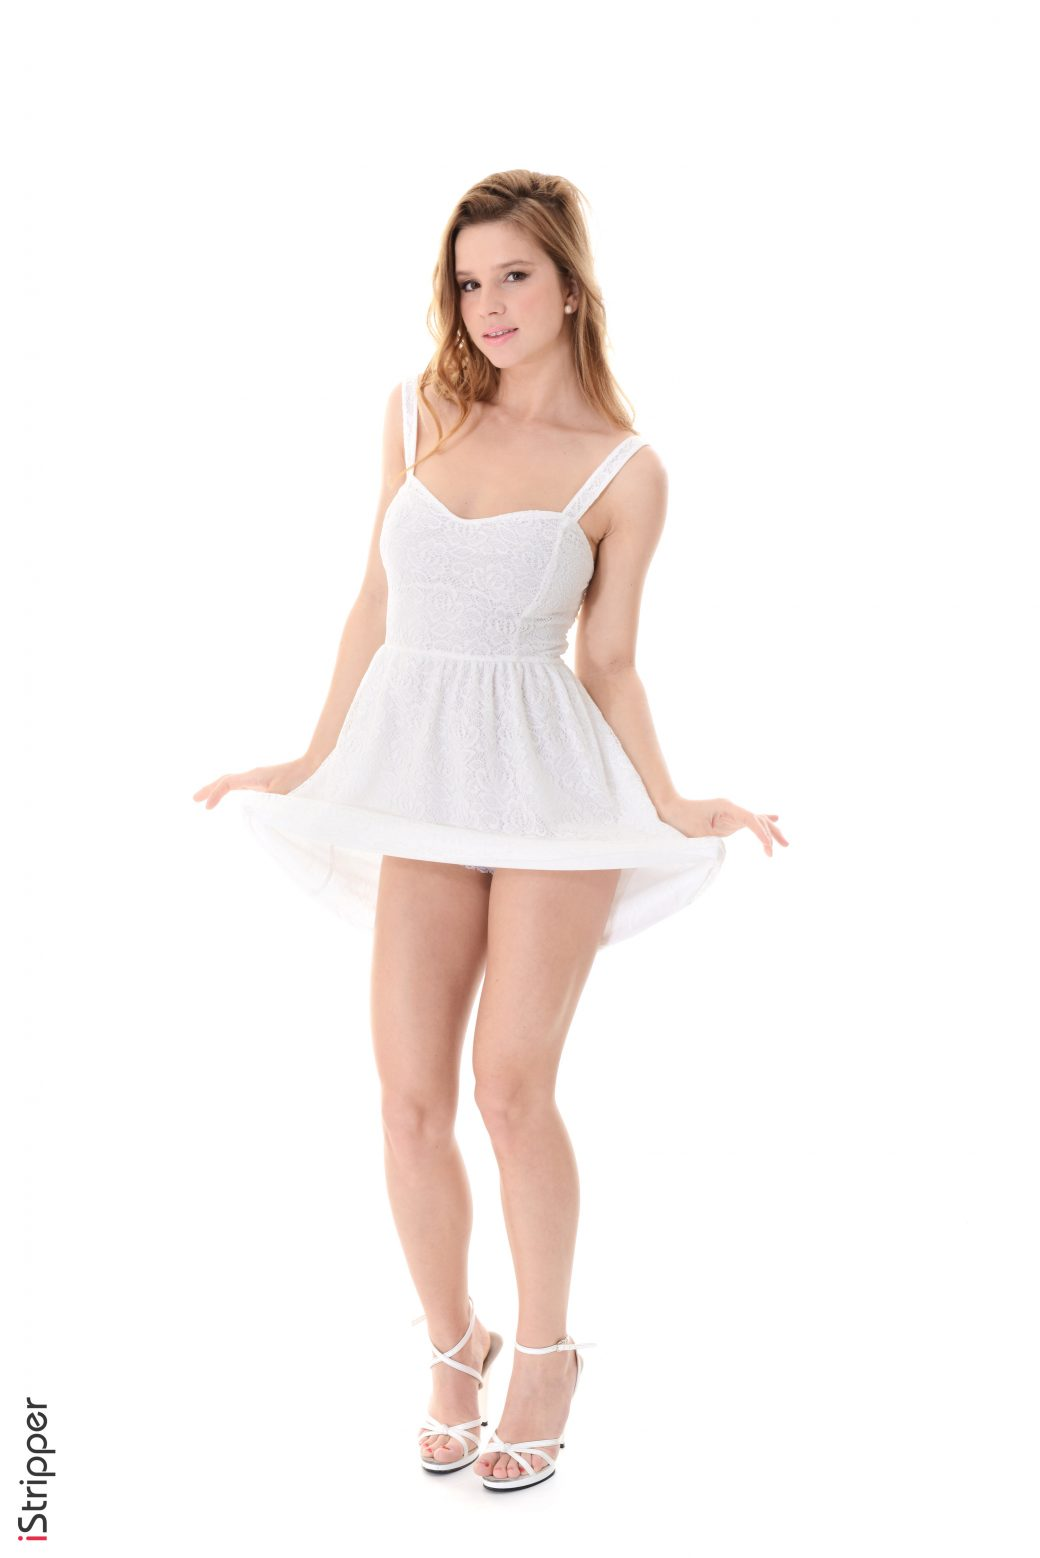 Vanessa Mio Little Angel - Virtual sexy dance of pornstar